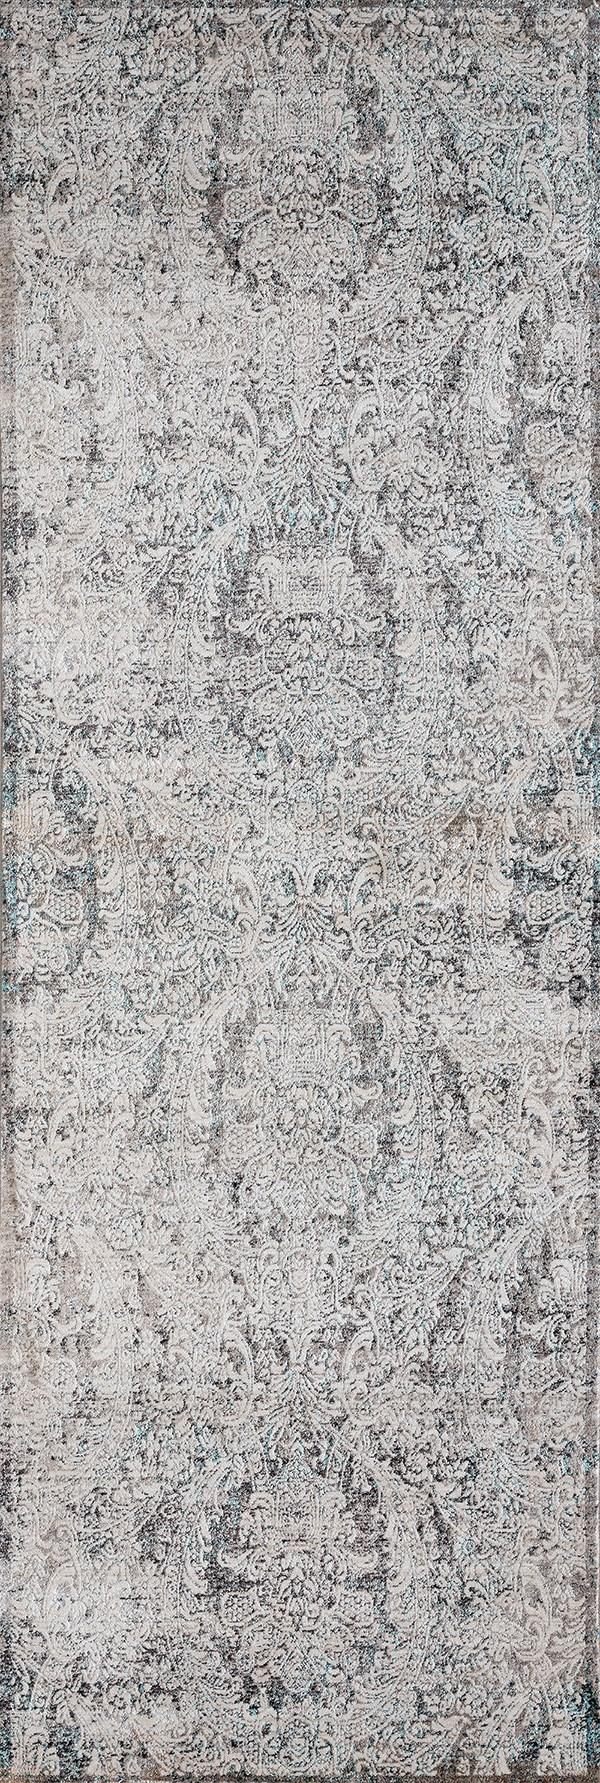 Turquoise (1805-40169) Vintage / Overdyed Area Rug